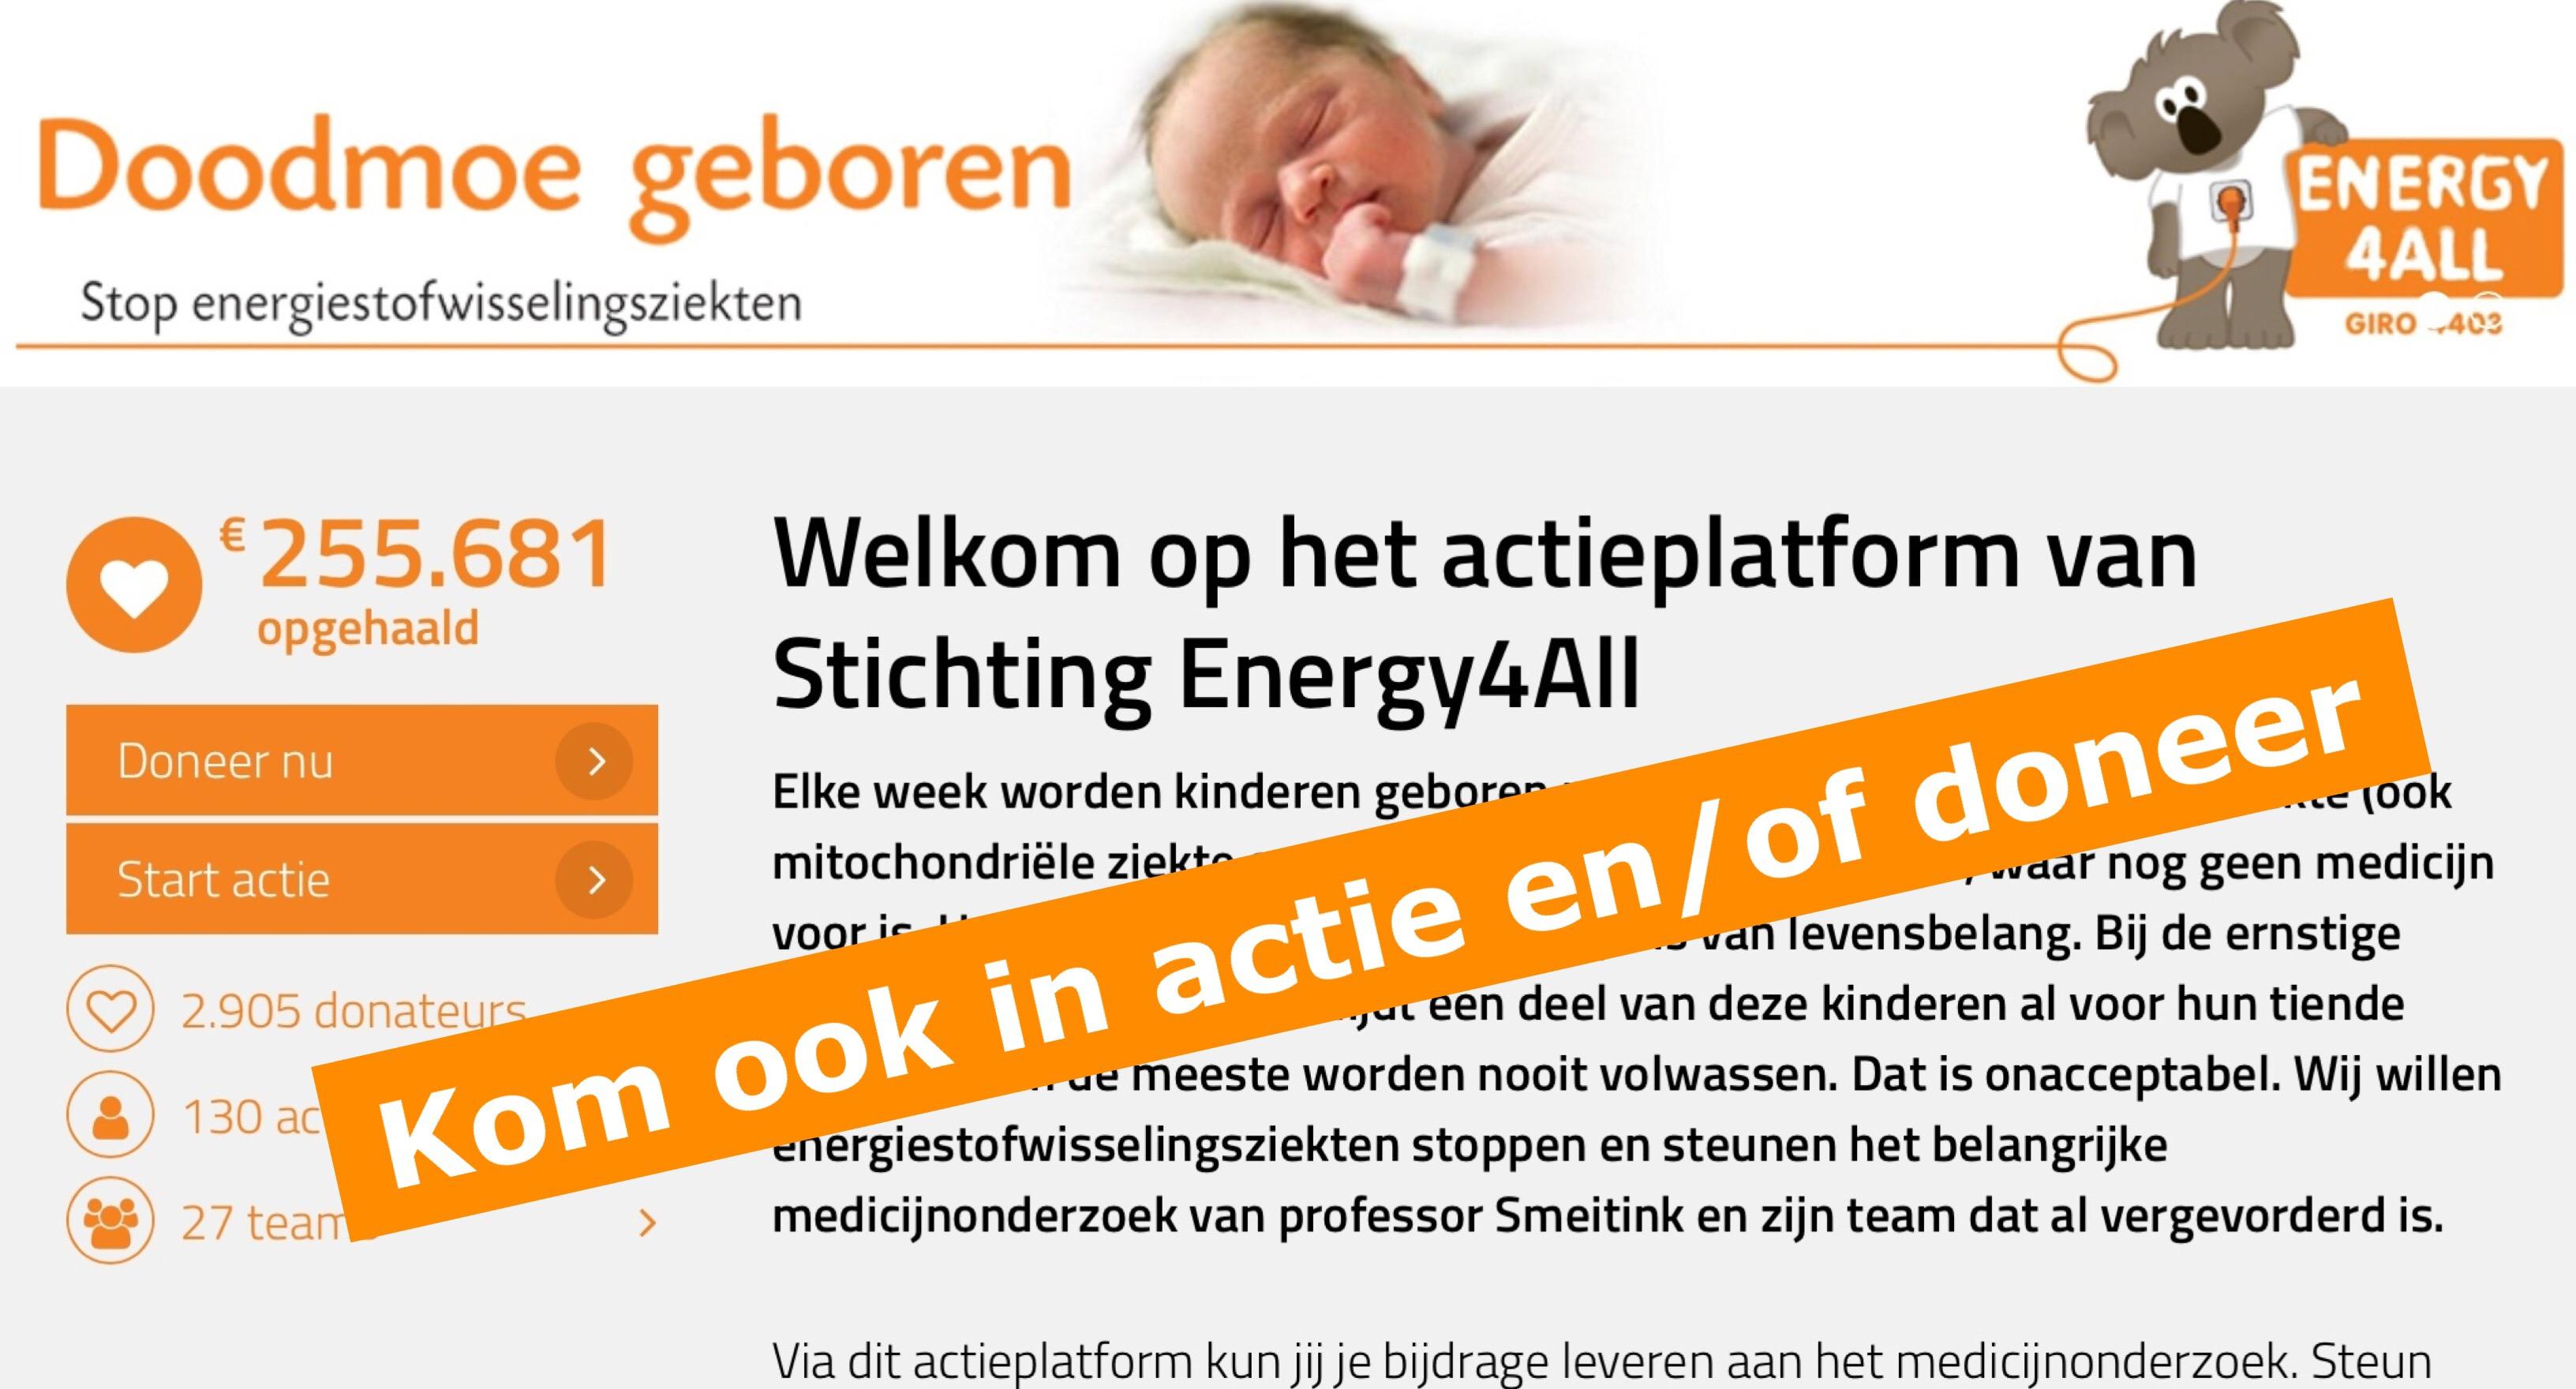 Actieplatform-Stichting-Energy4All